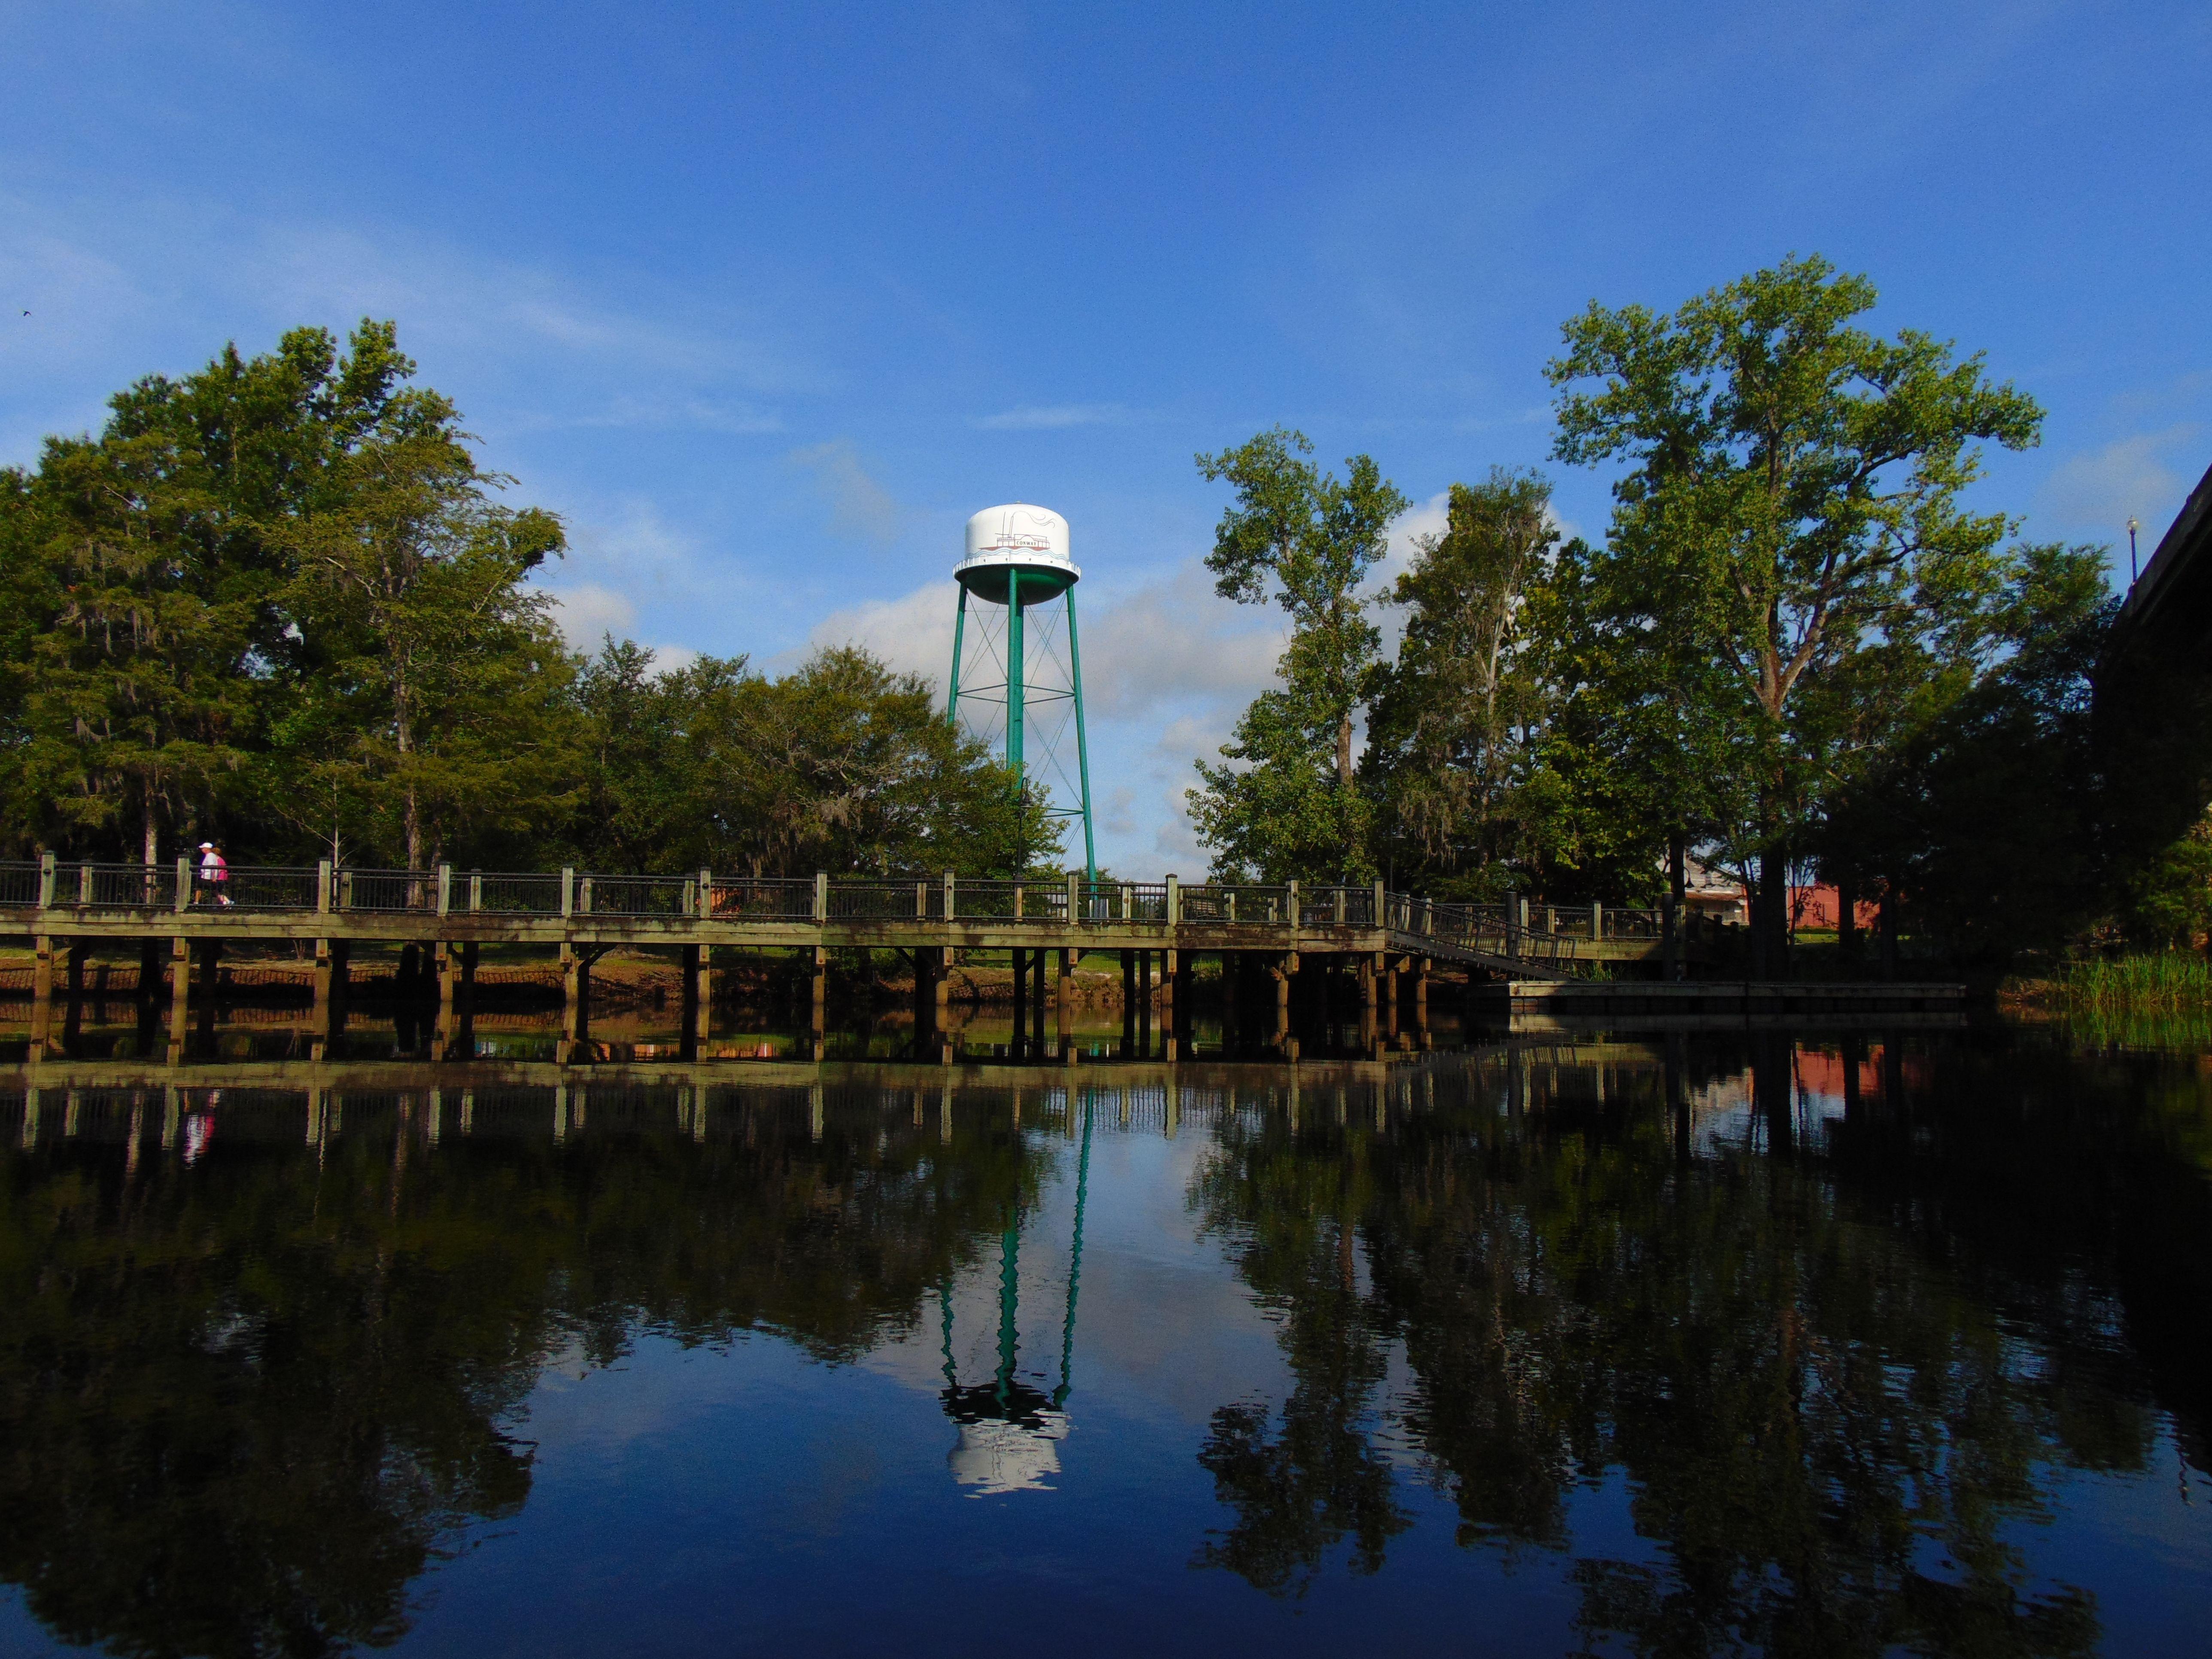 Conway water tower adventure tours kayak tours boat tours